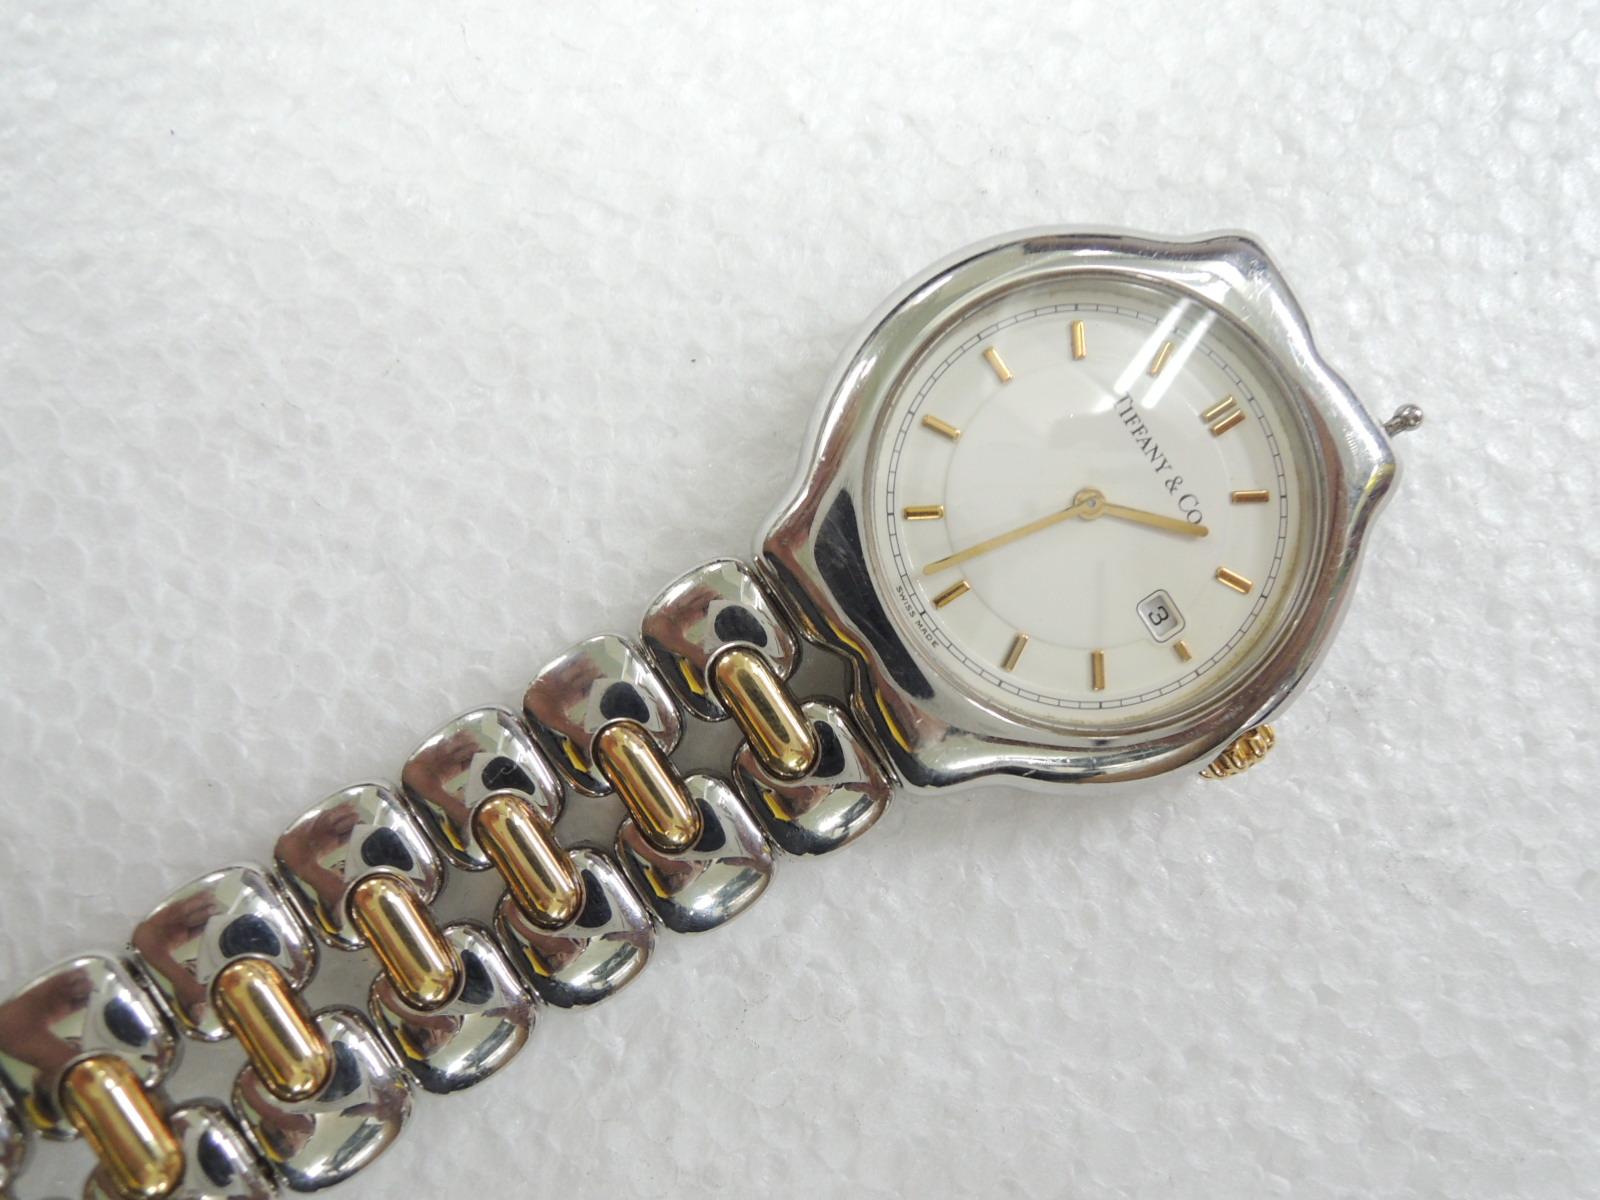 66a6a209e9 ティファニーの時計修理 | 時計修理 リペア Watch事業部